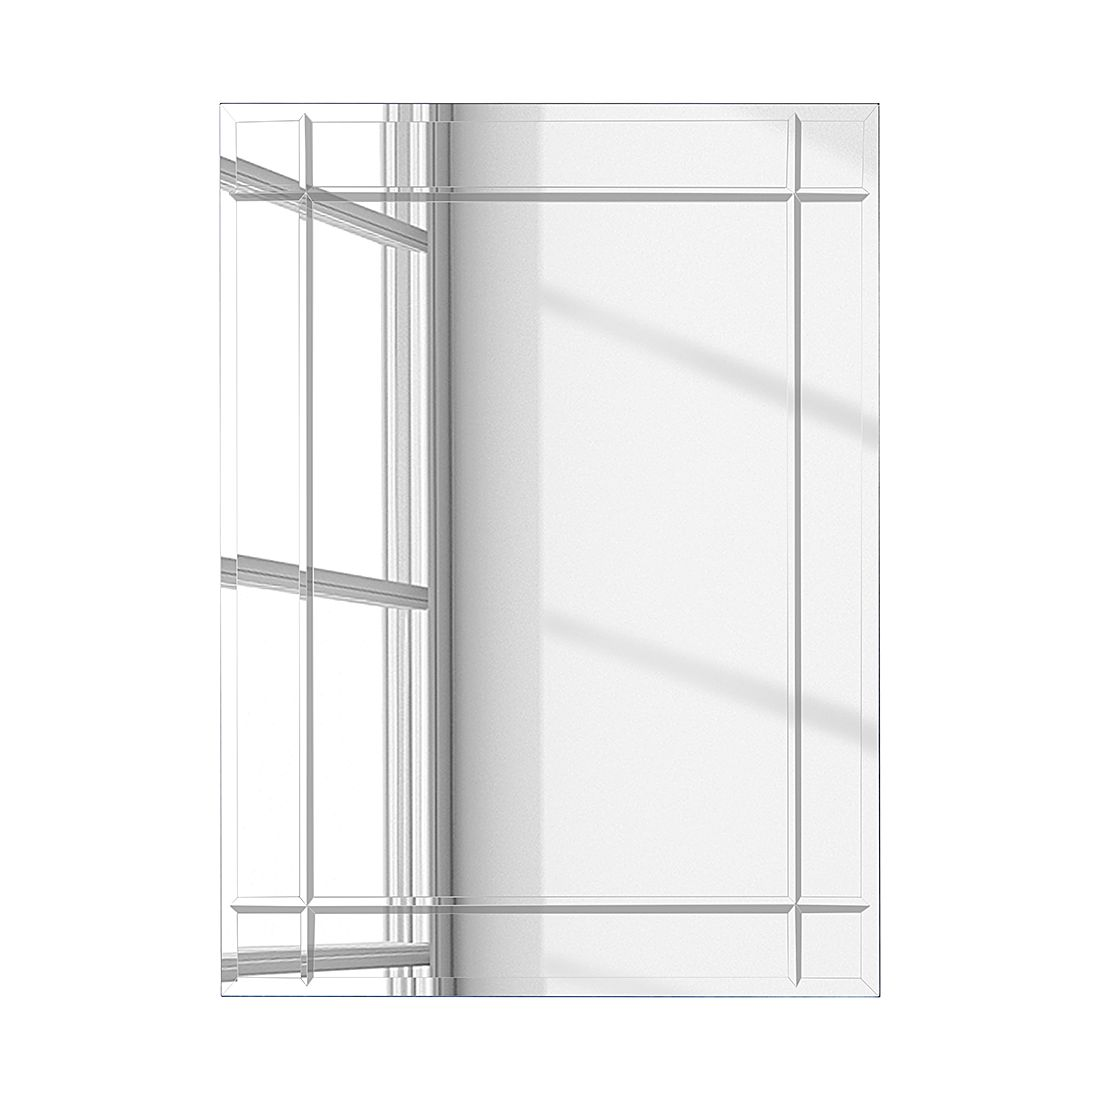 Spiegel Brillar II - 70x90cm, mooved